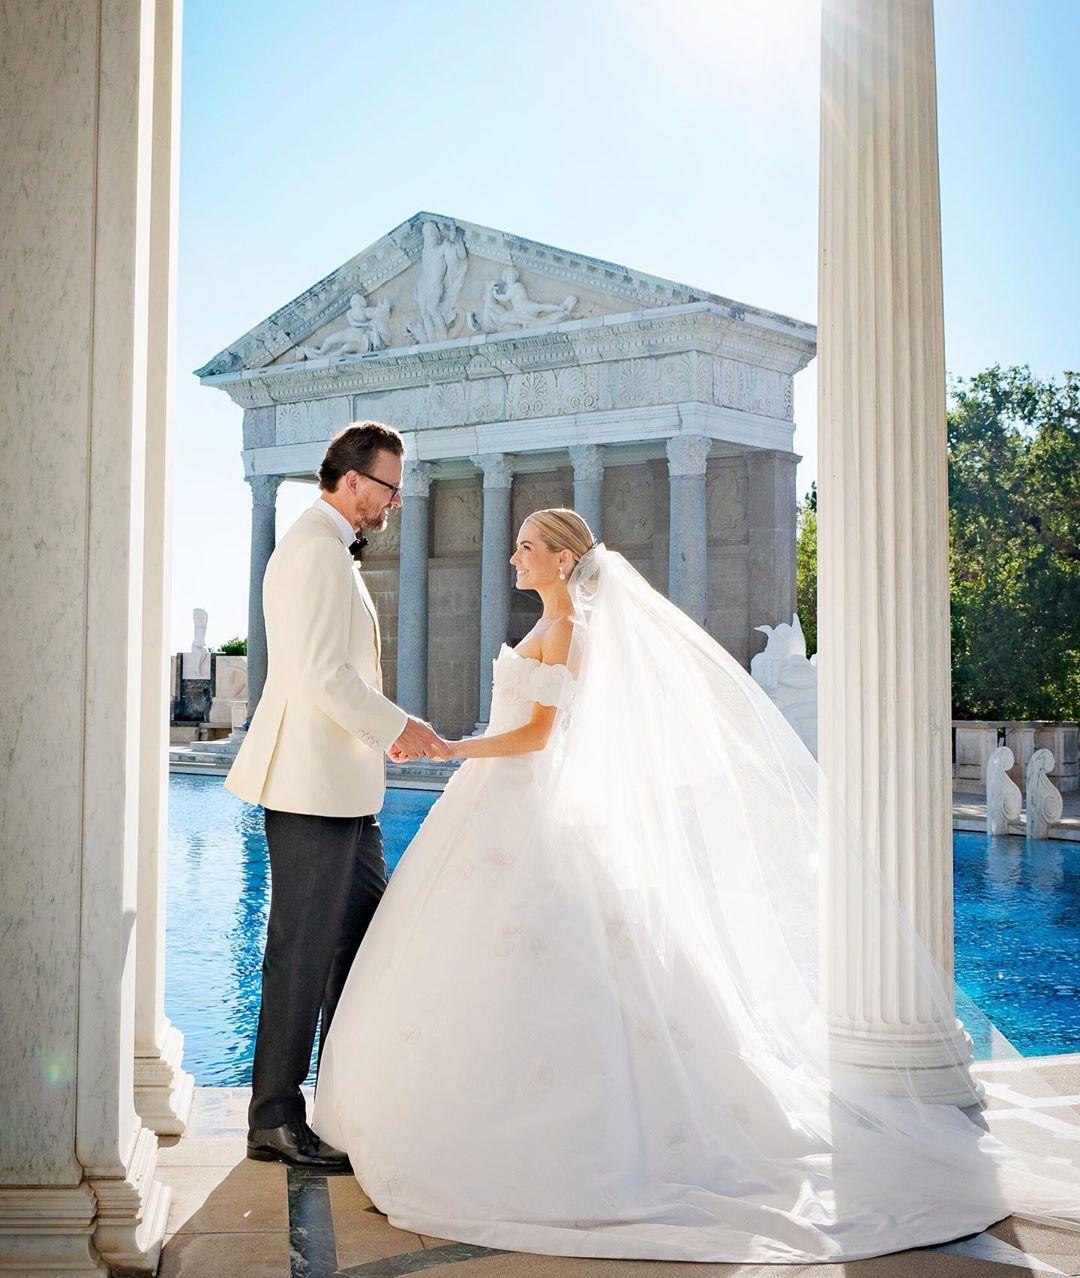 Svadba slávnych II - Amanda Hearst a Joachim Rønning